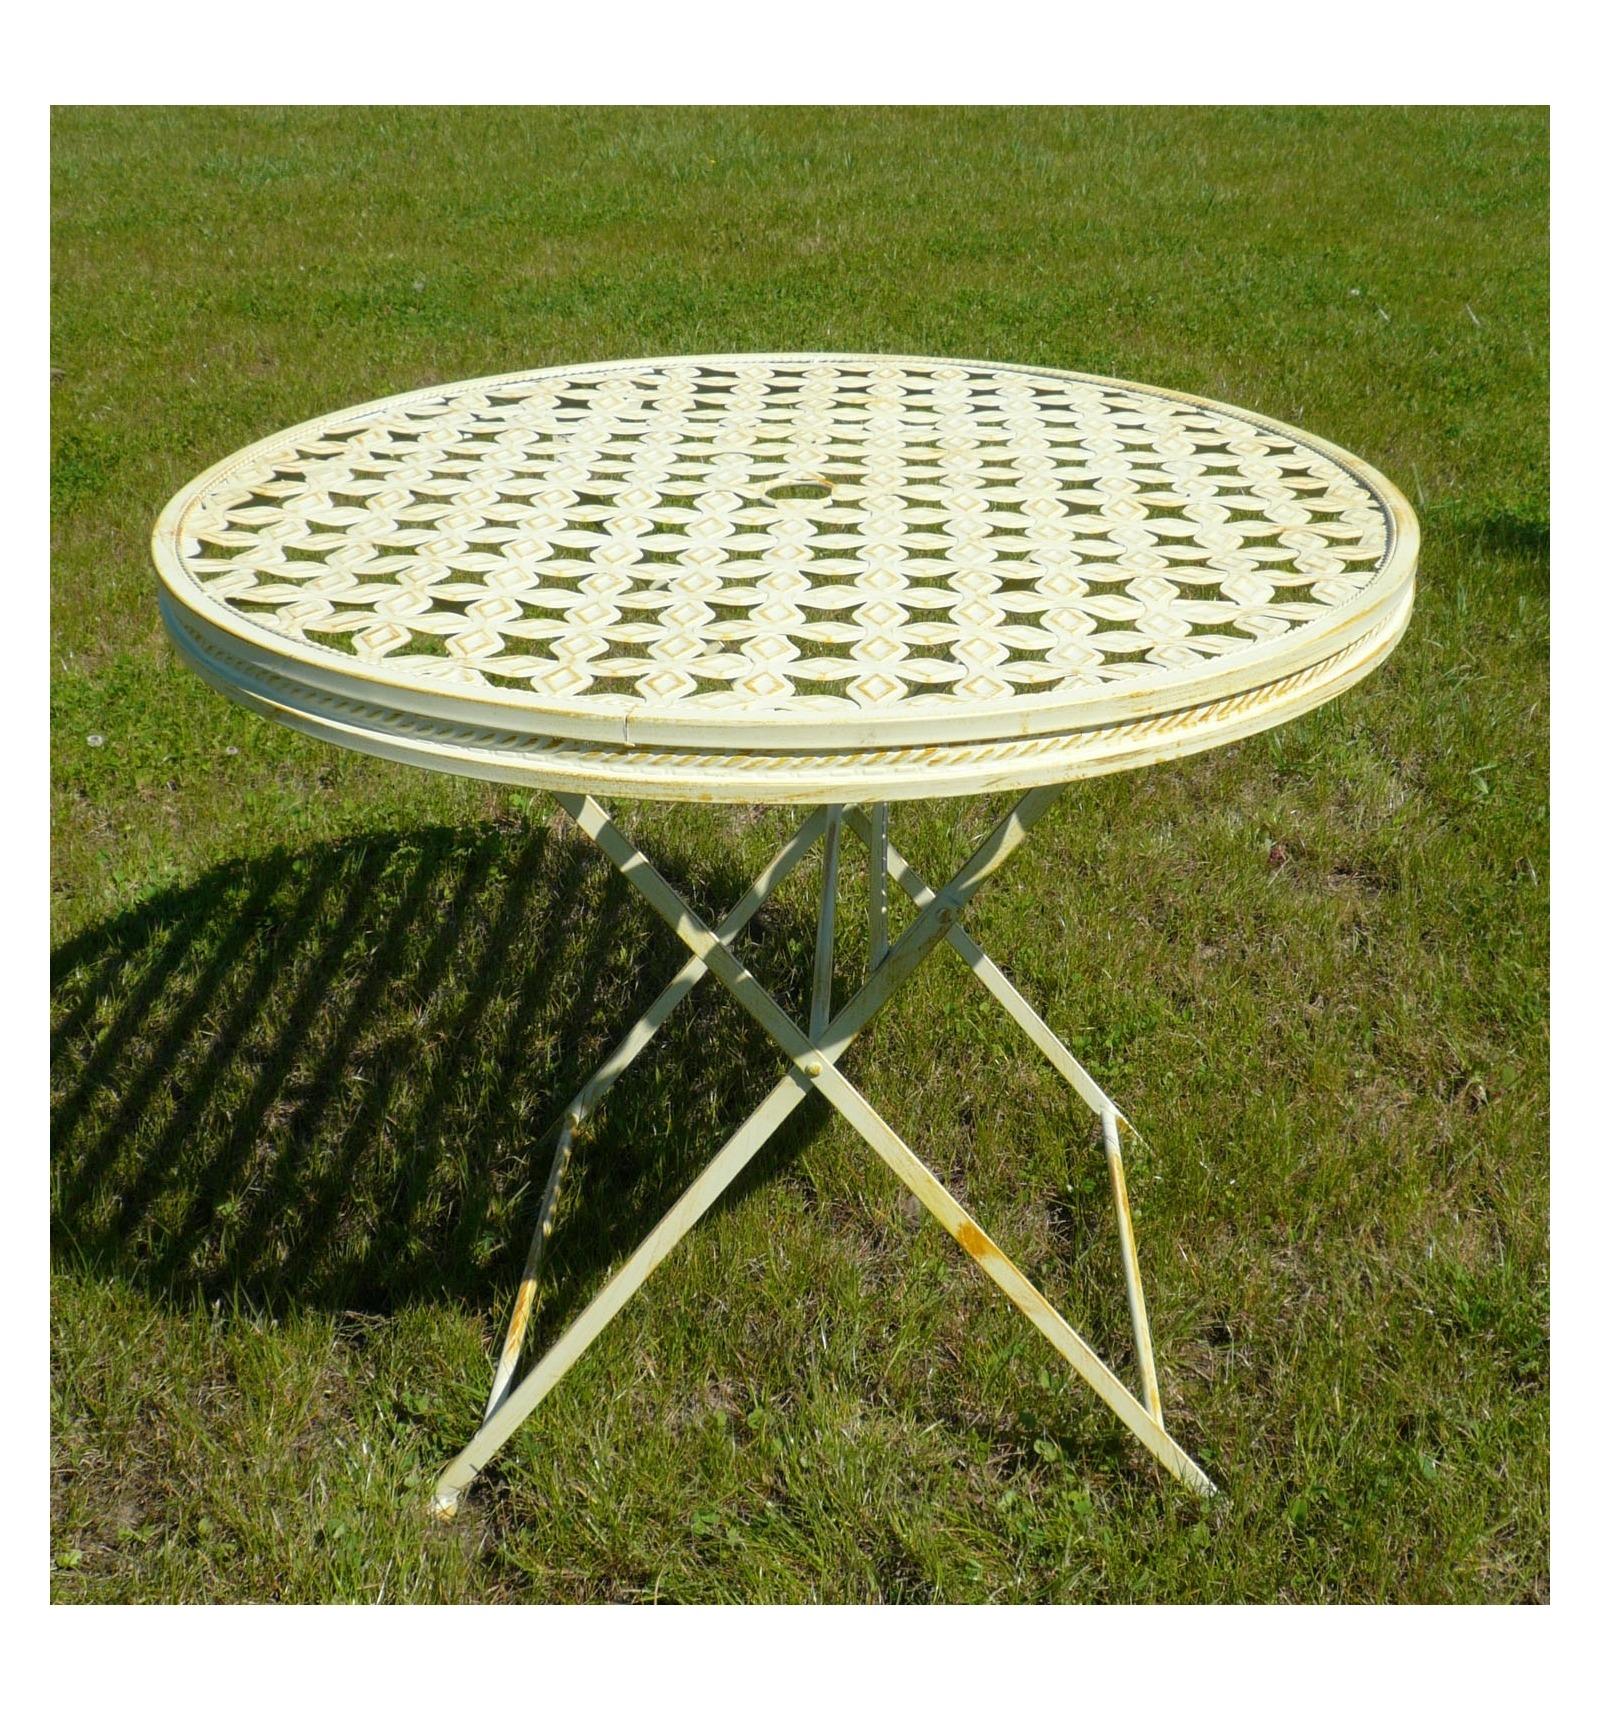 El hierro forjado muebles de jard n mesas sillas bancos for Muebles de jardin de hierro